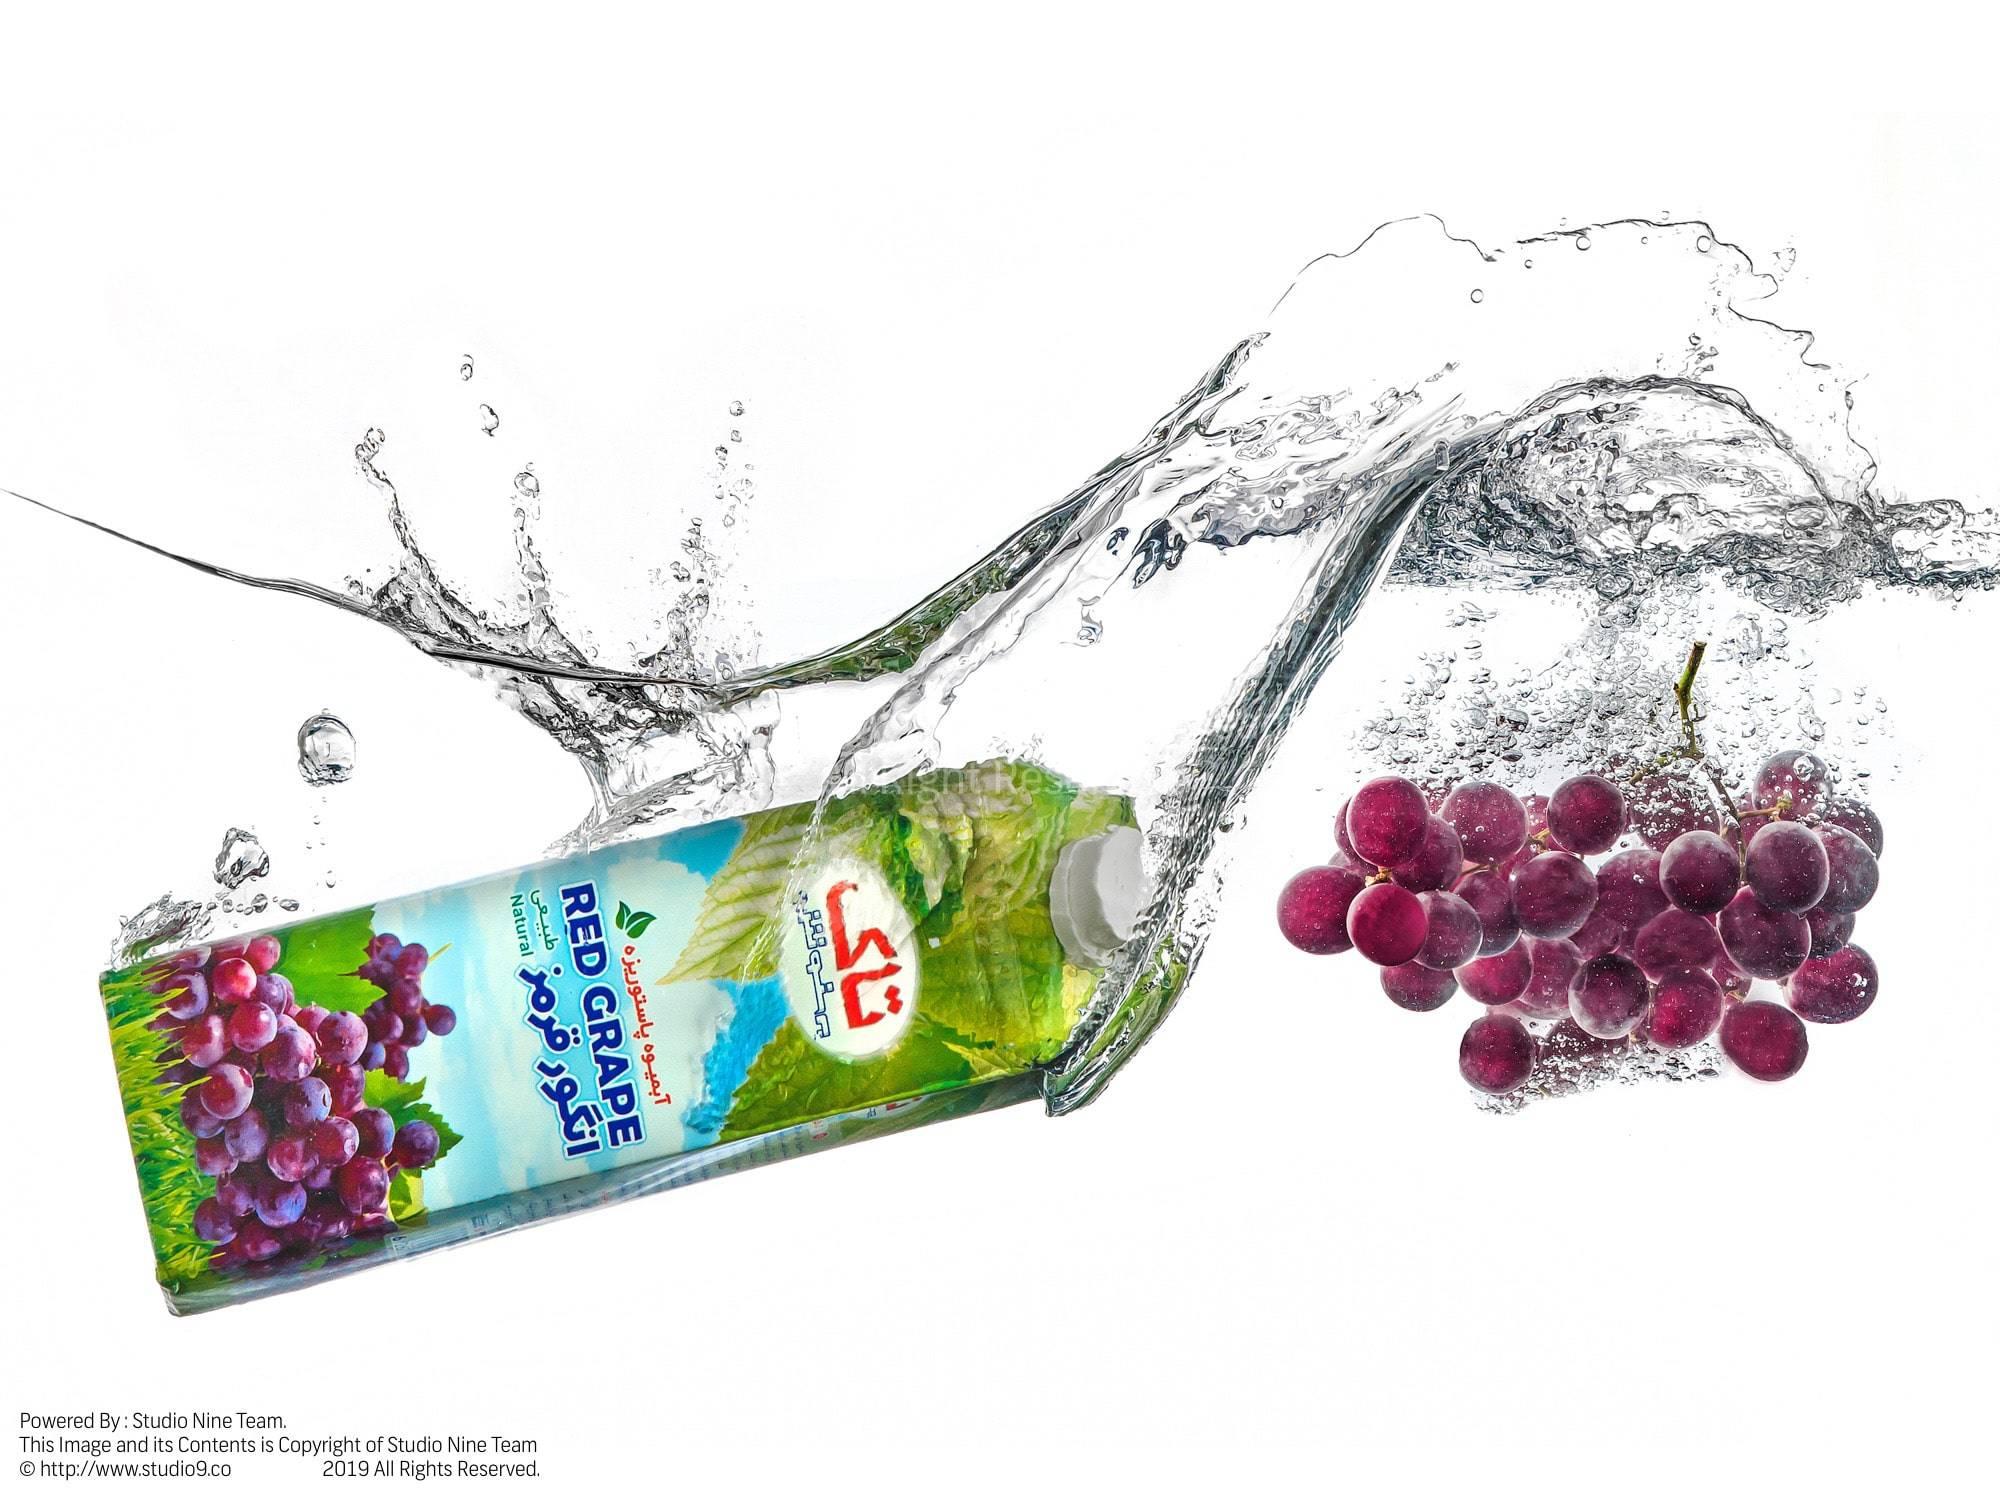 عکس تبلیغاتی محصولات بهنوش | آبمیوه انگور قرمز تاک بهنوش